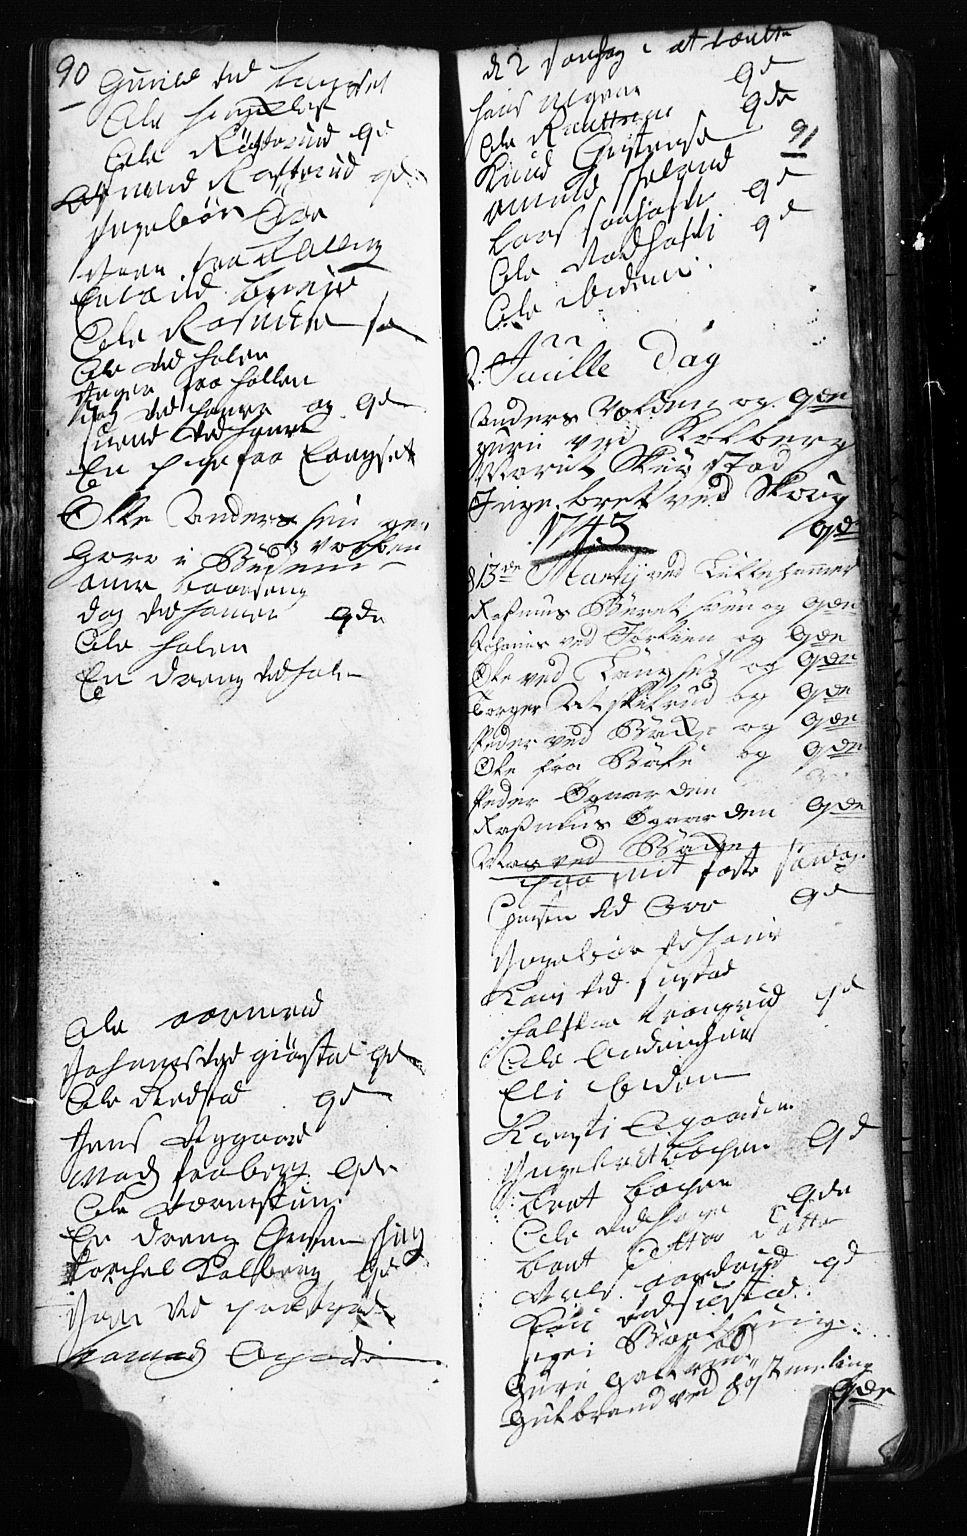 SAH, Fåberg prestekontor, Klokkerbok nr. 2, 1741-1756, s. 90-91